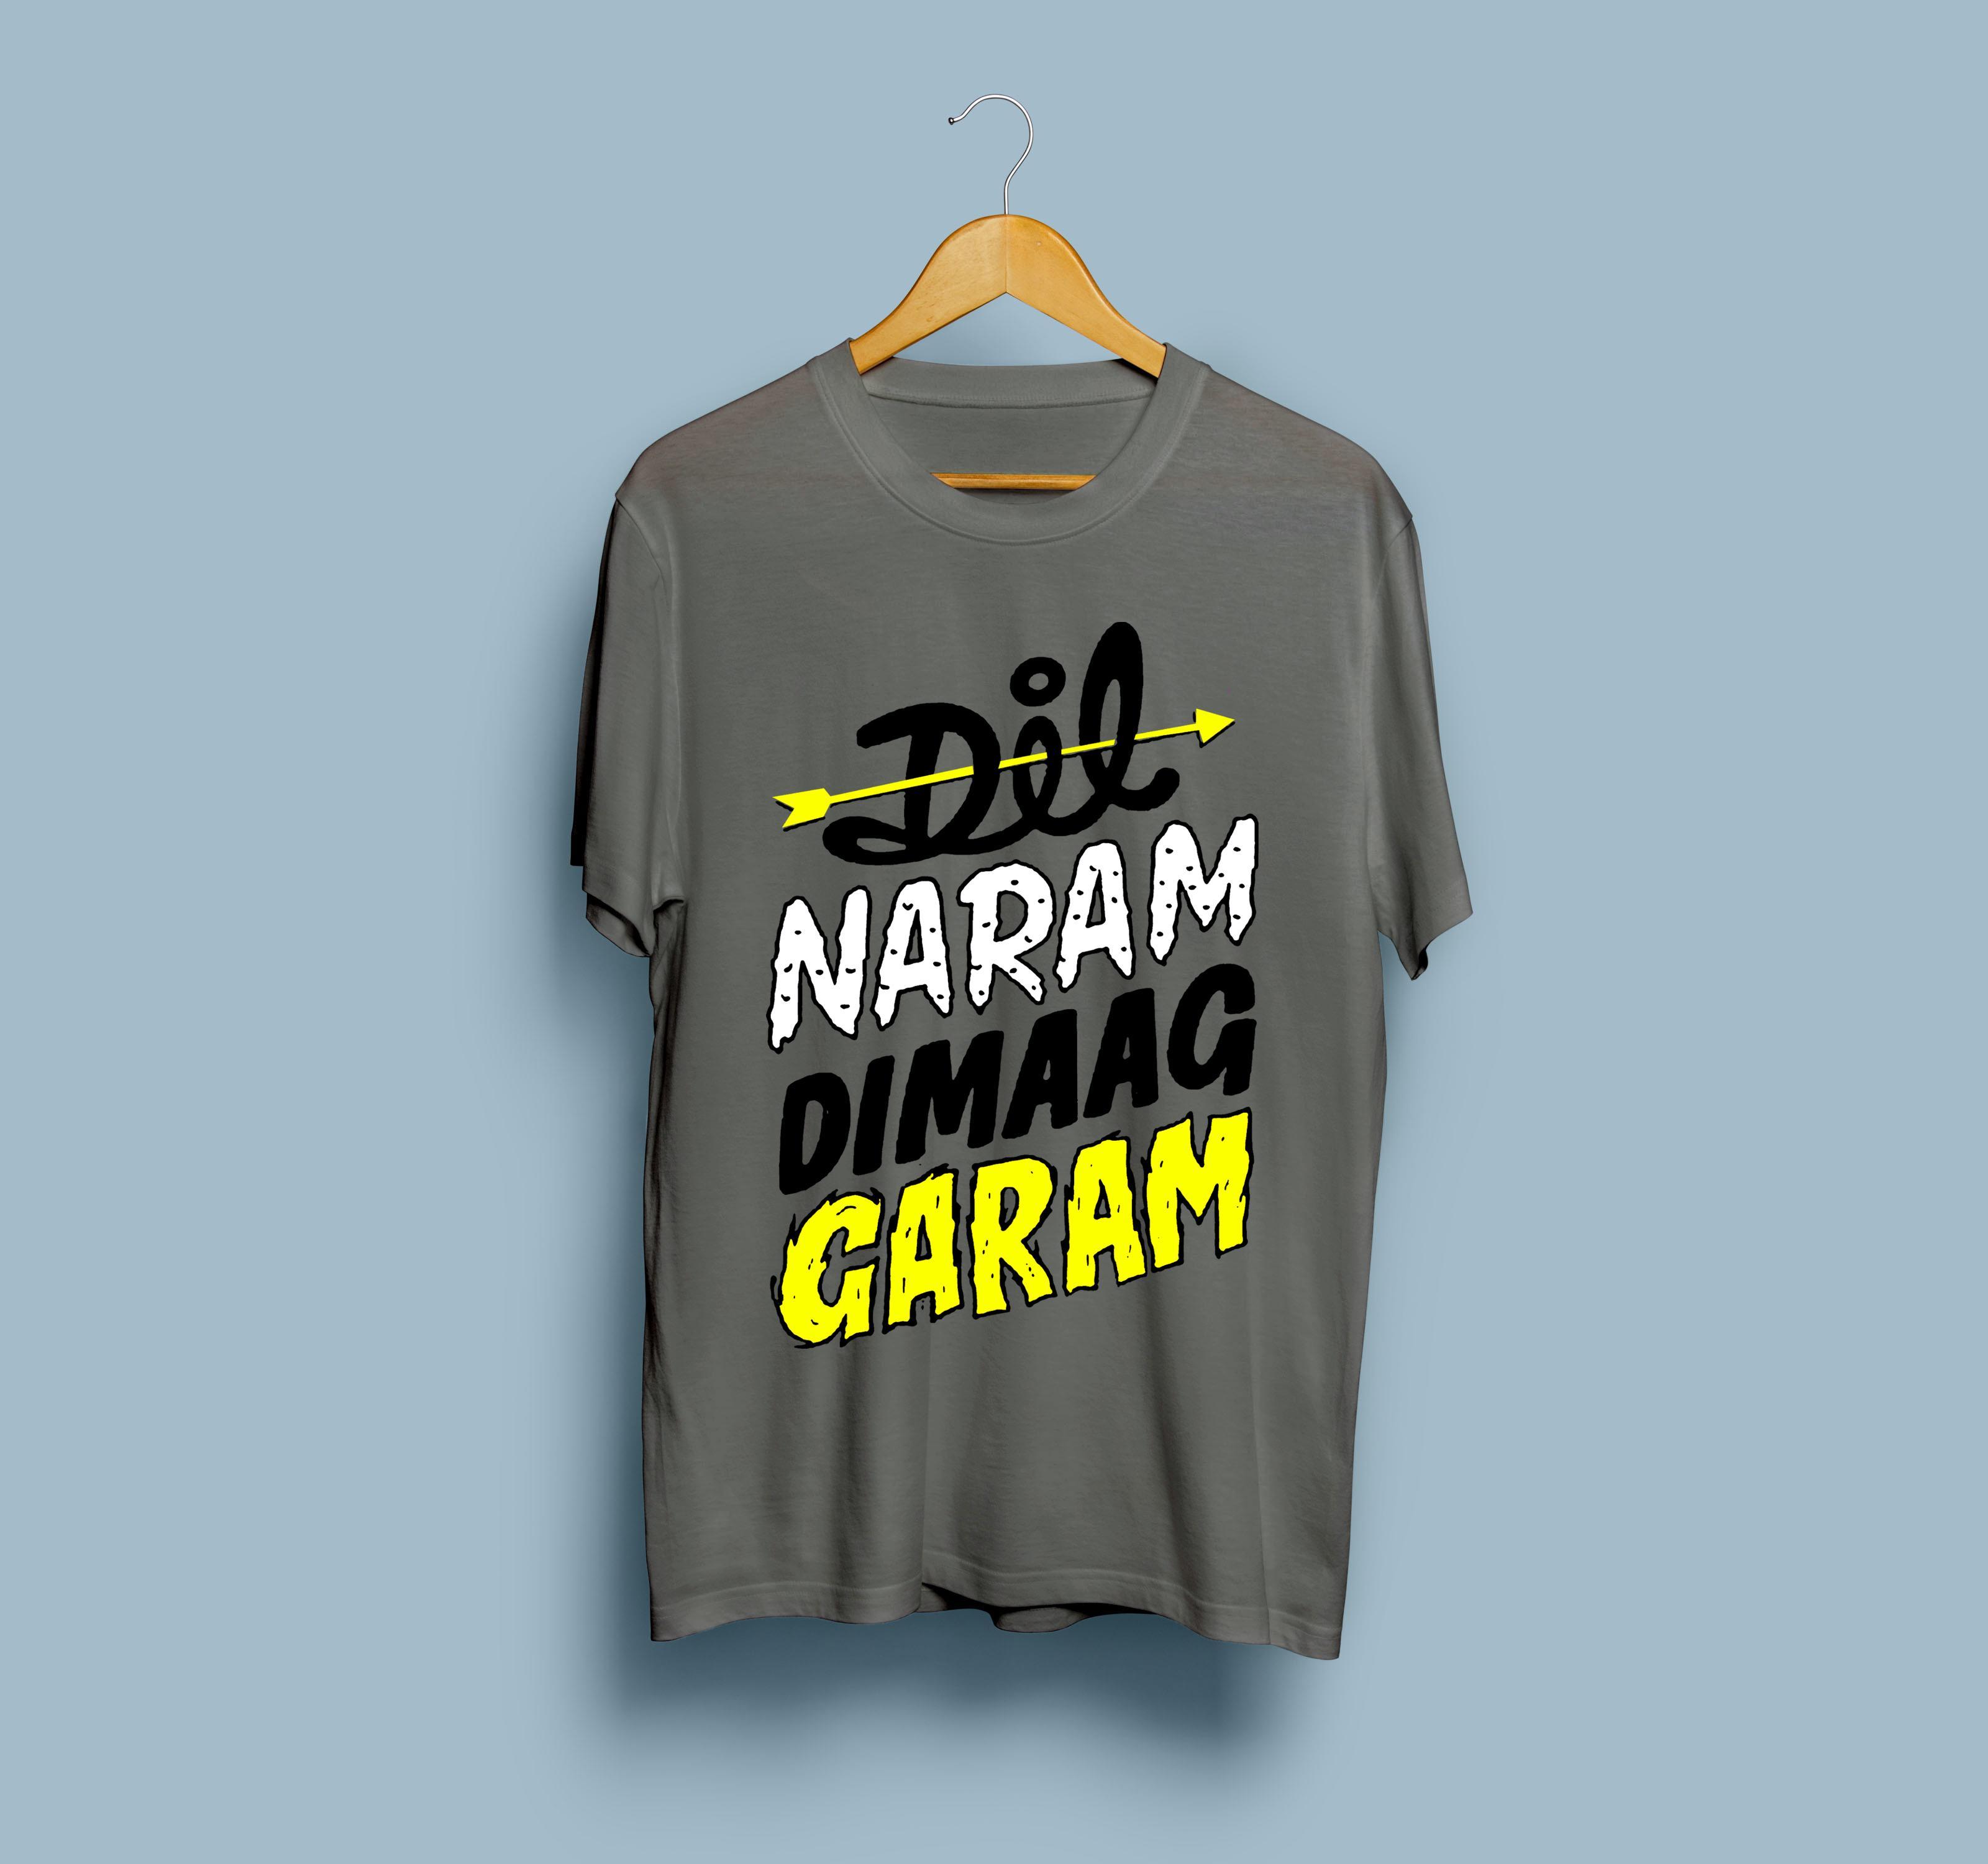 5a11b127fce Dil Naram Dimaag Garam Printed T shirt For Men & Women